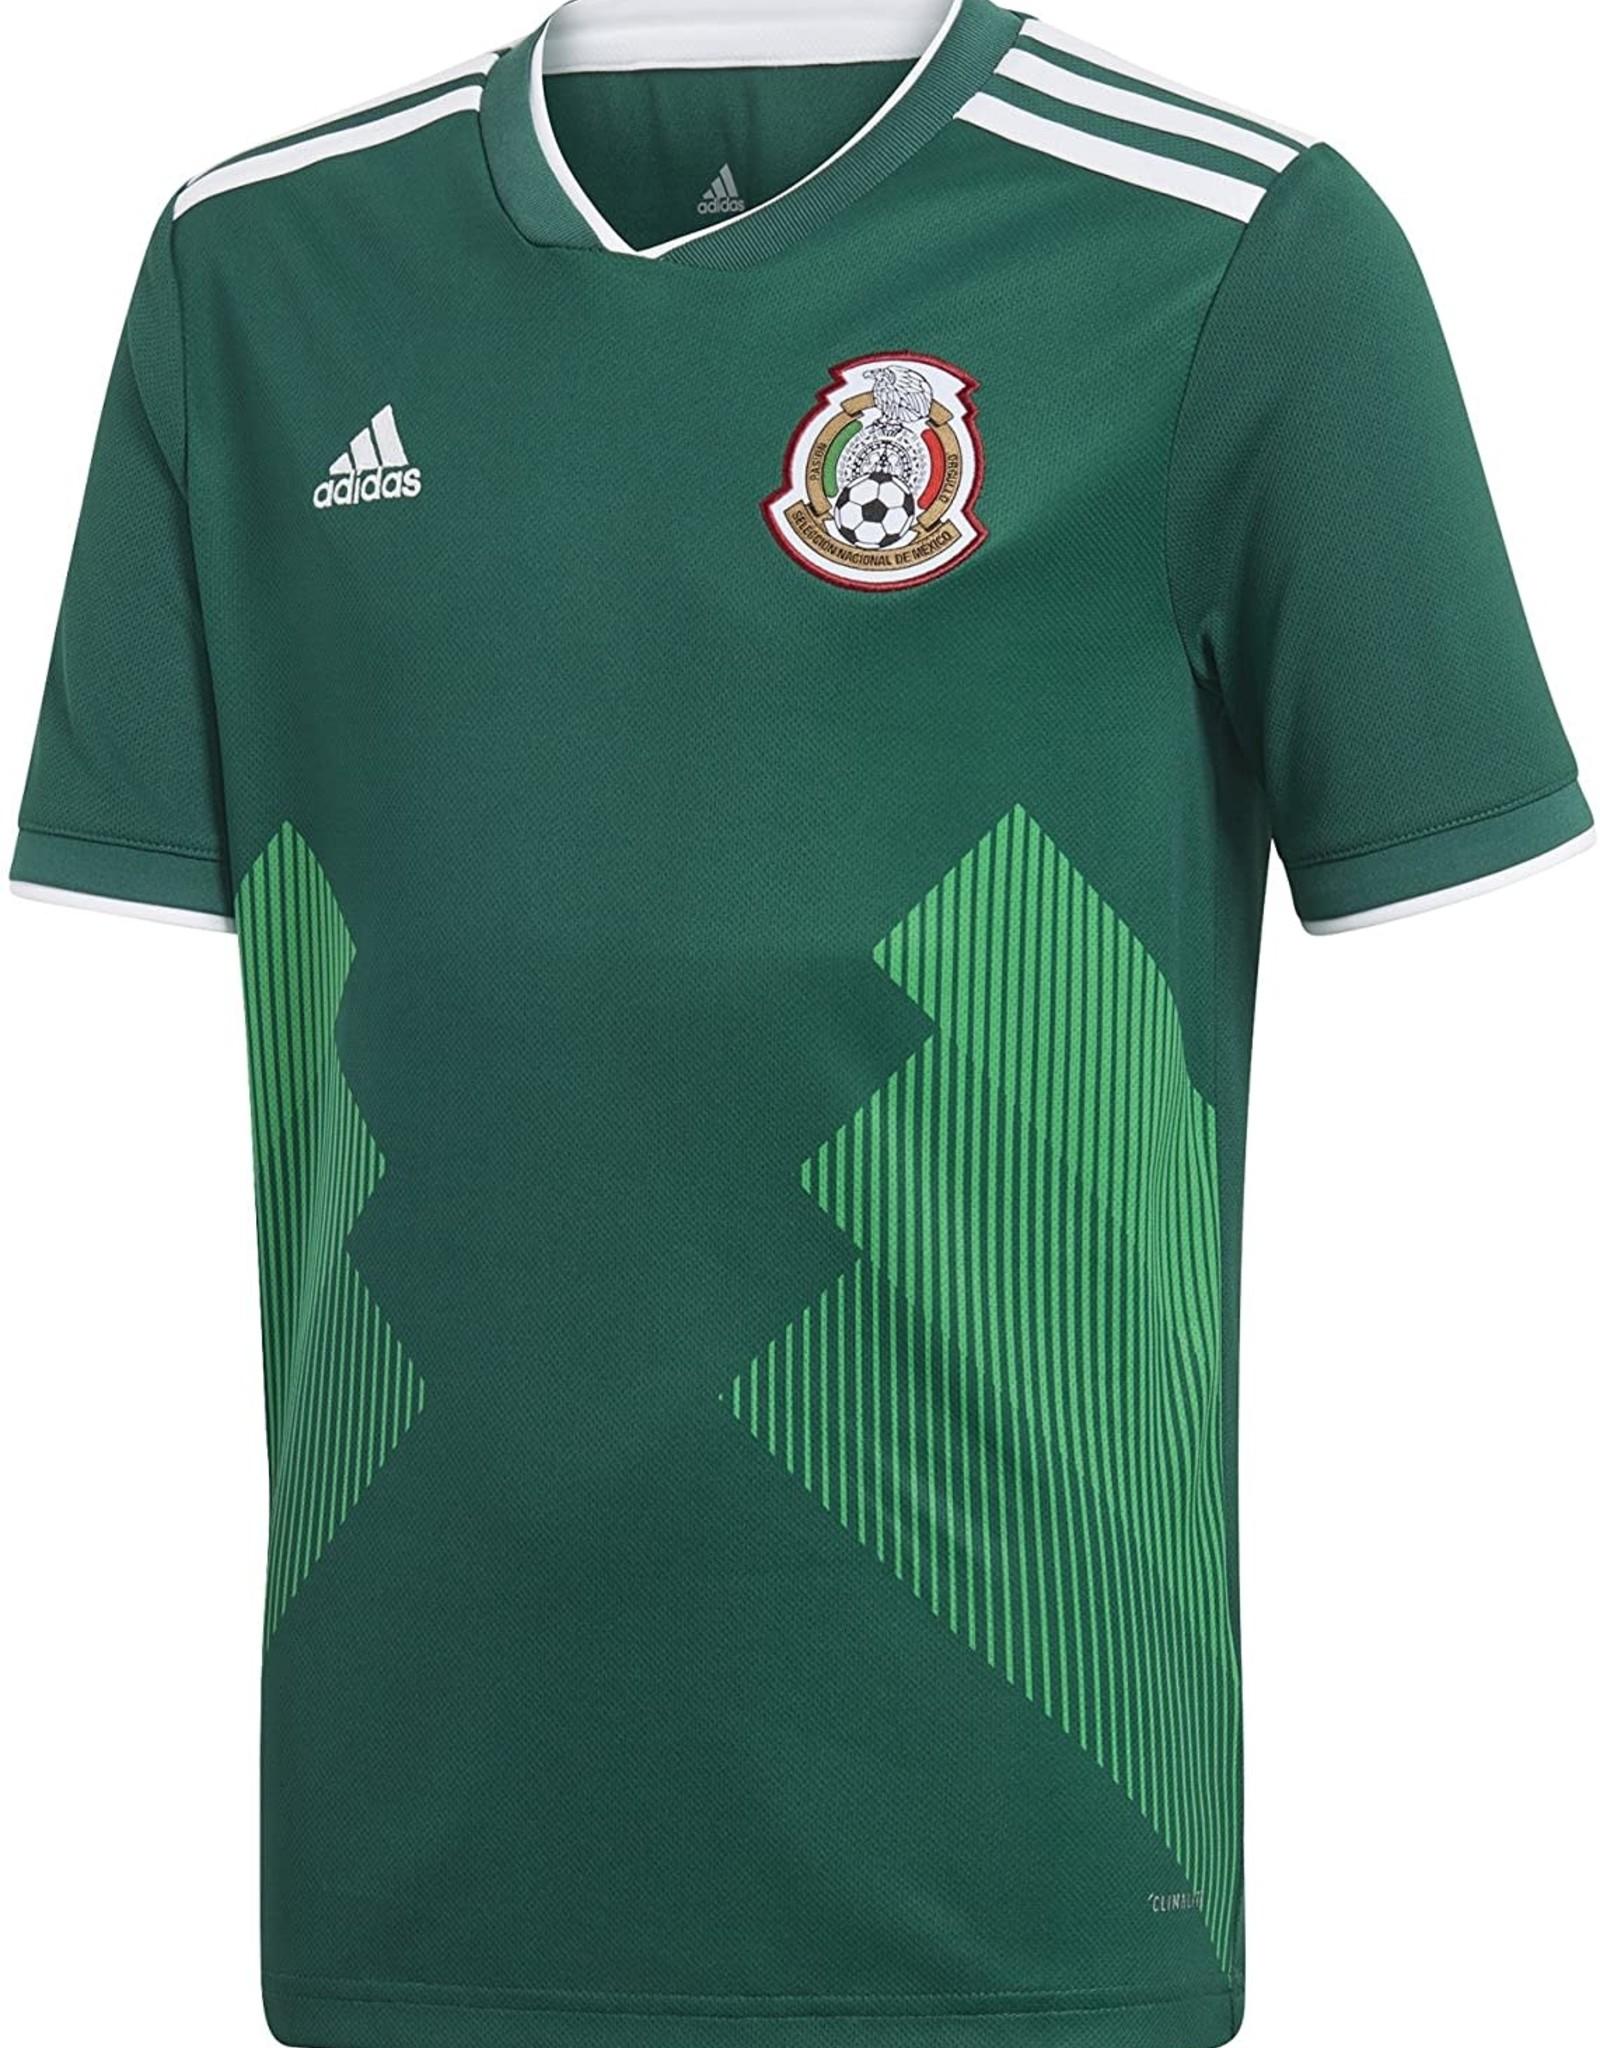 Adidas Mexico Home Jersey